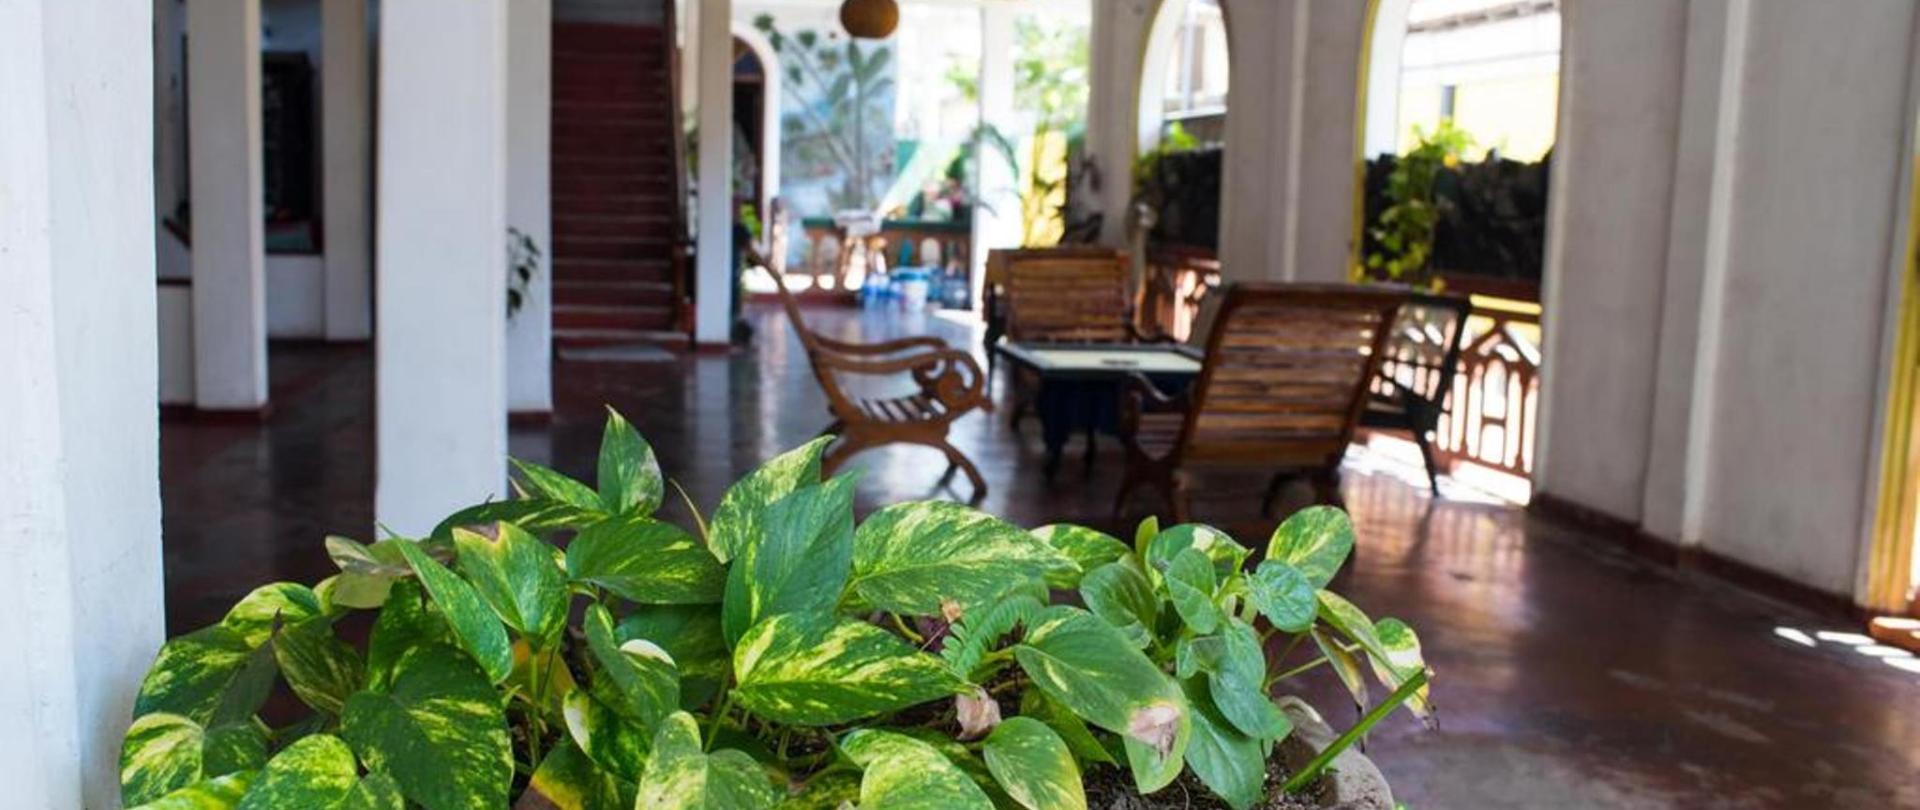 Casalanka Hotel Hikkaduwa 스리랑카 .jpg